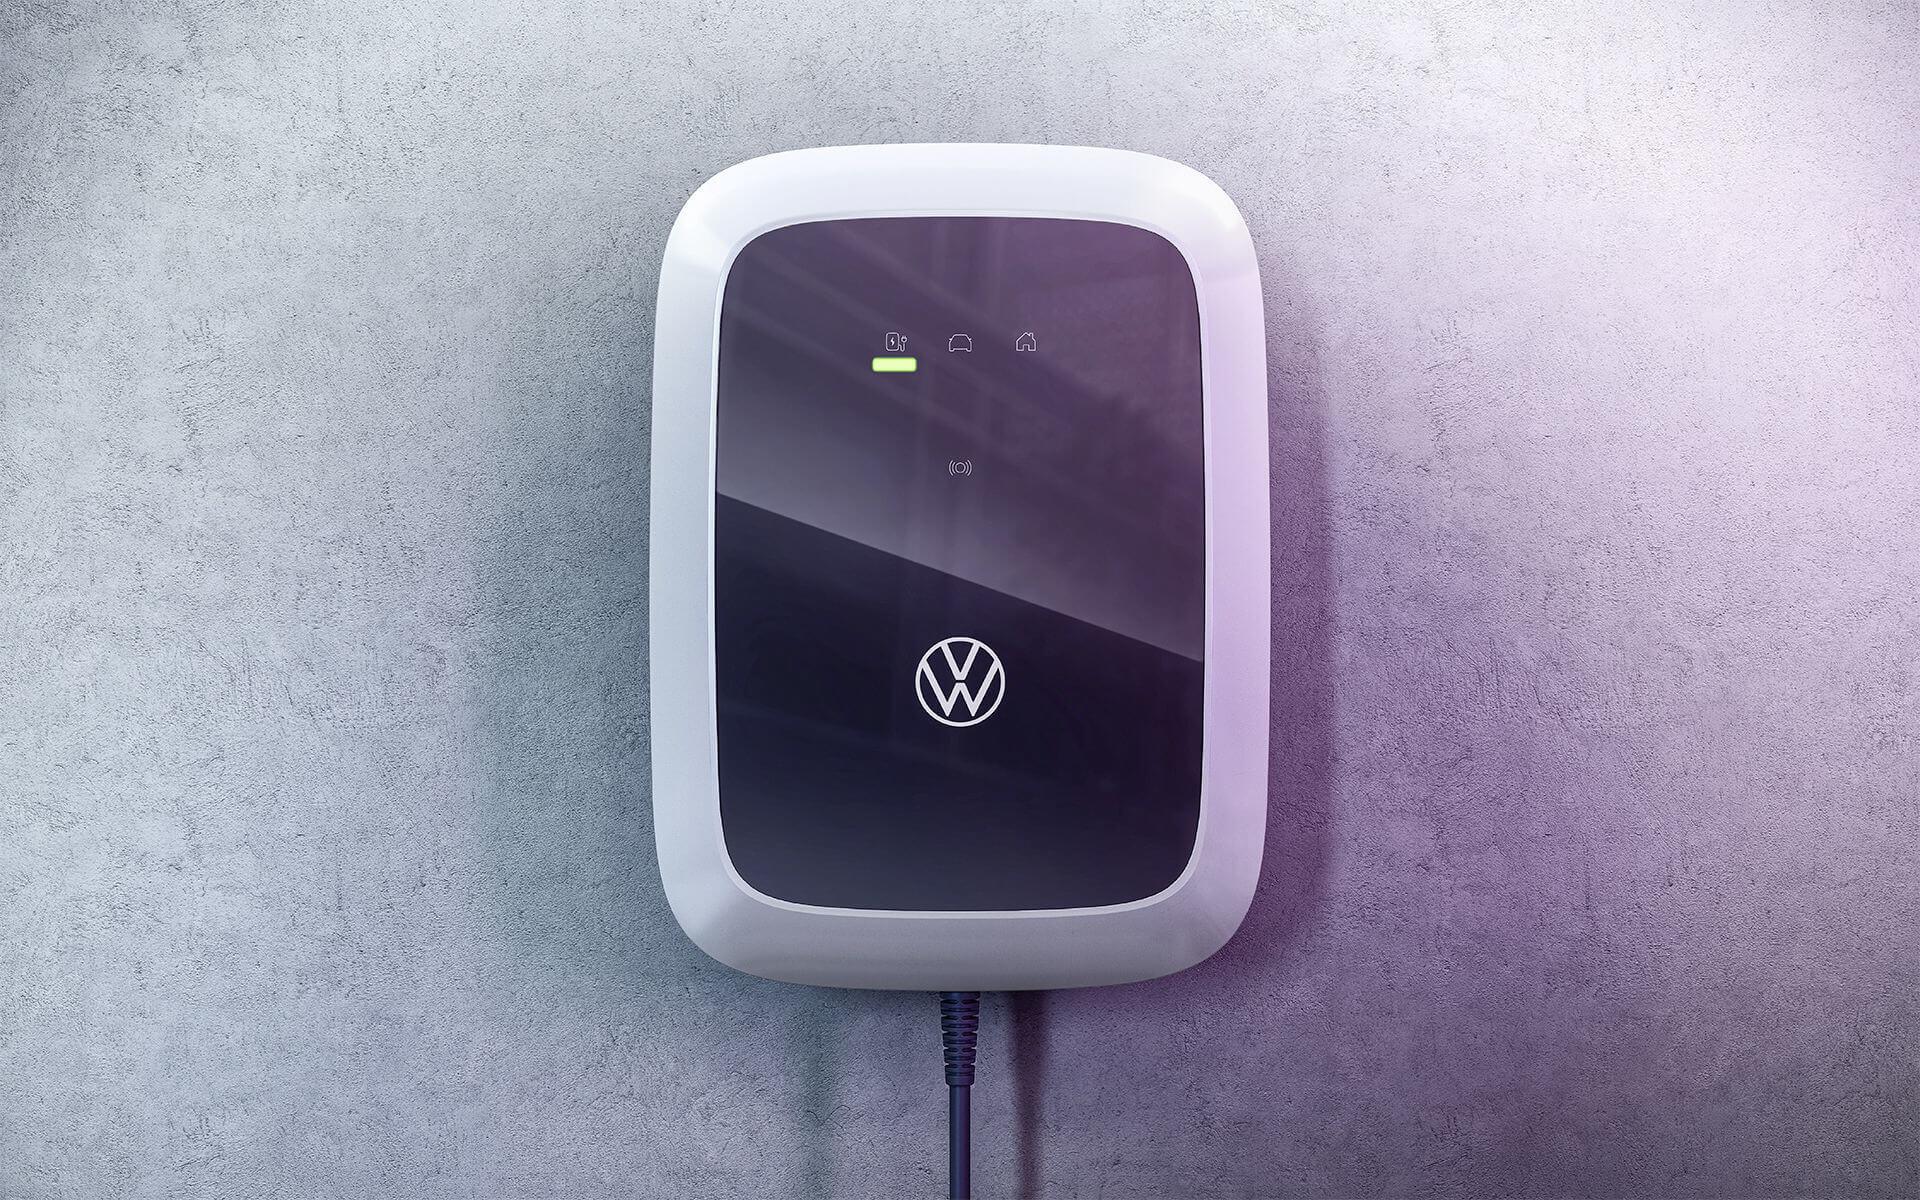 Volkswagen представляет настенную зарядную станцию ID. Charger по цене от €399